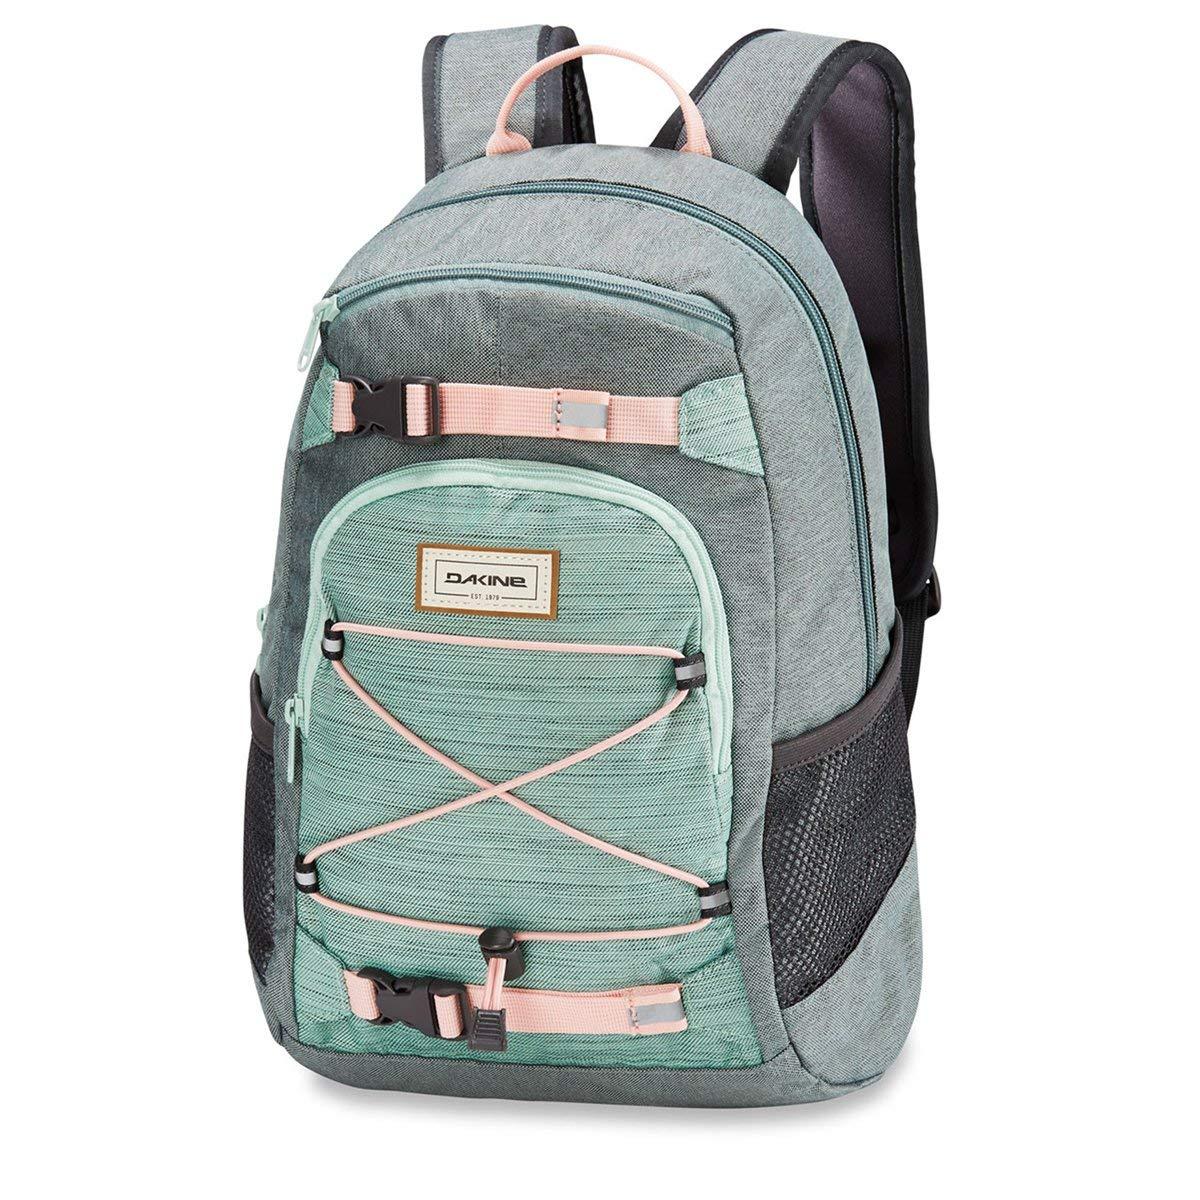 Dakine 10001452 Youth Grom 13L Backpack, Brighton